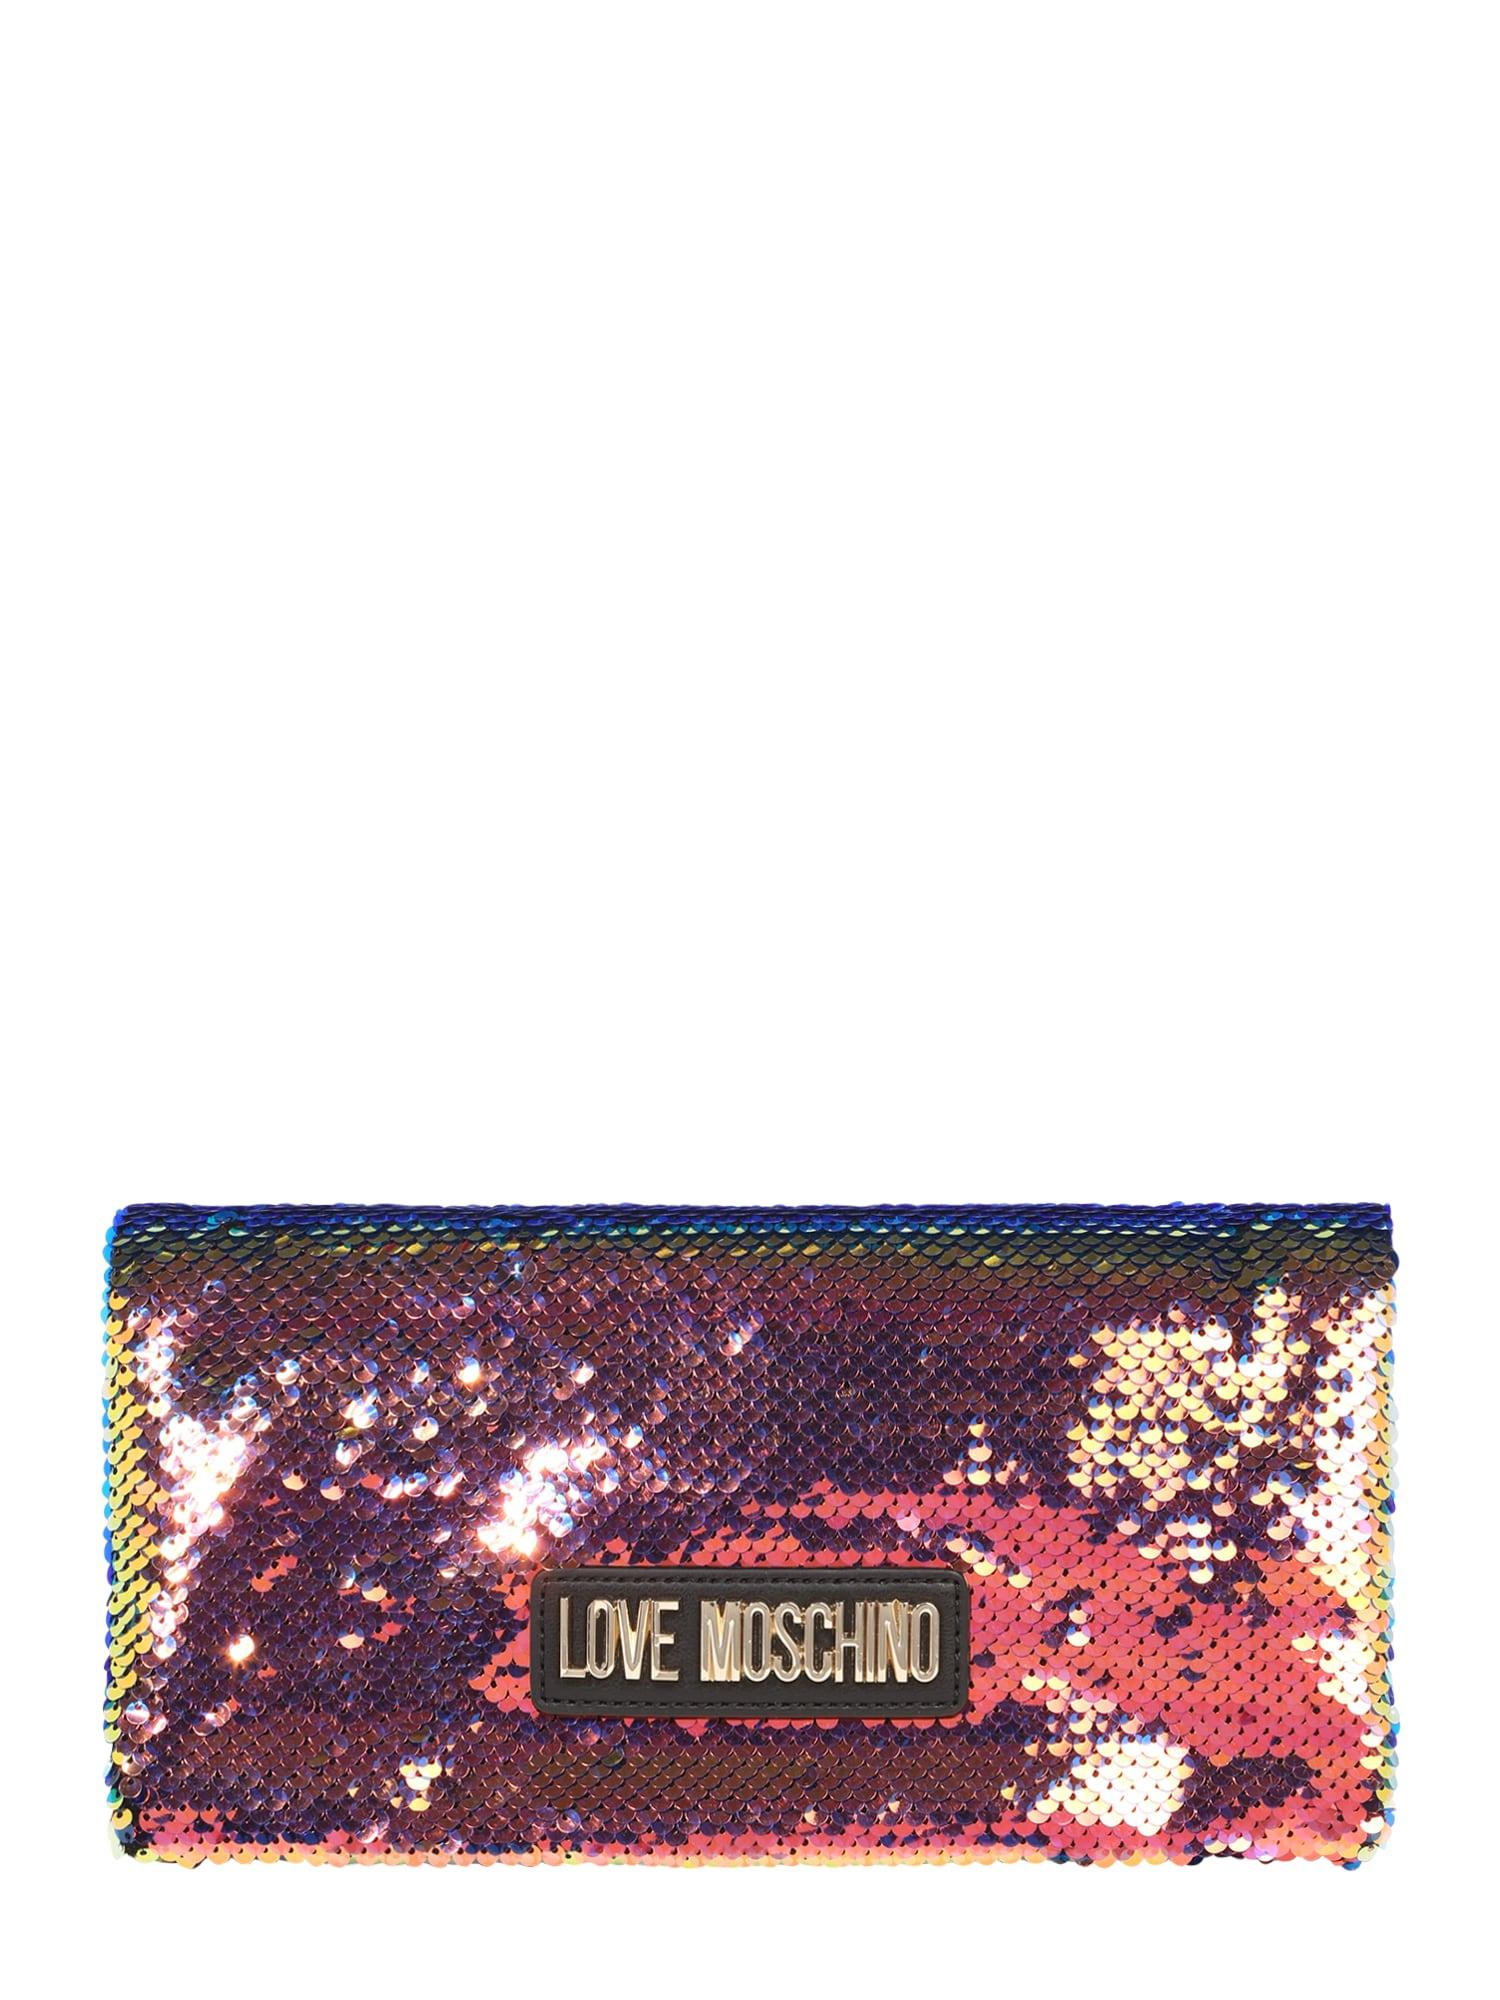 Taška přes rameno BORSA SEQUINS MULTICOLOR mix barev Love Moschino